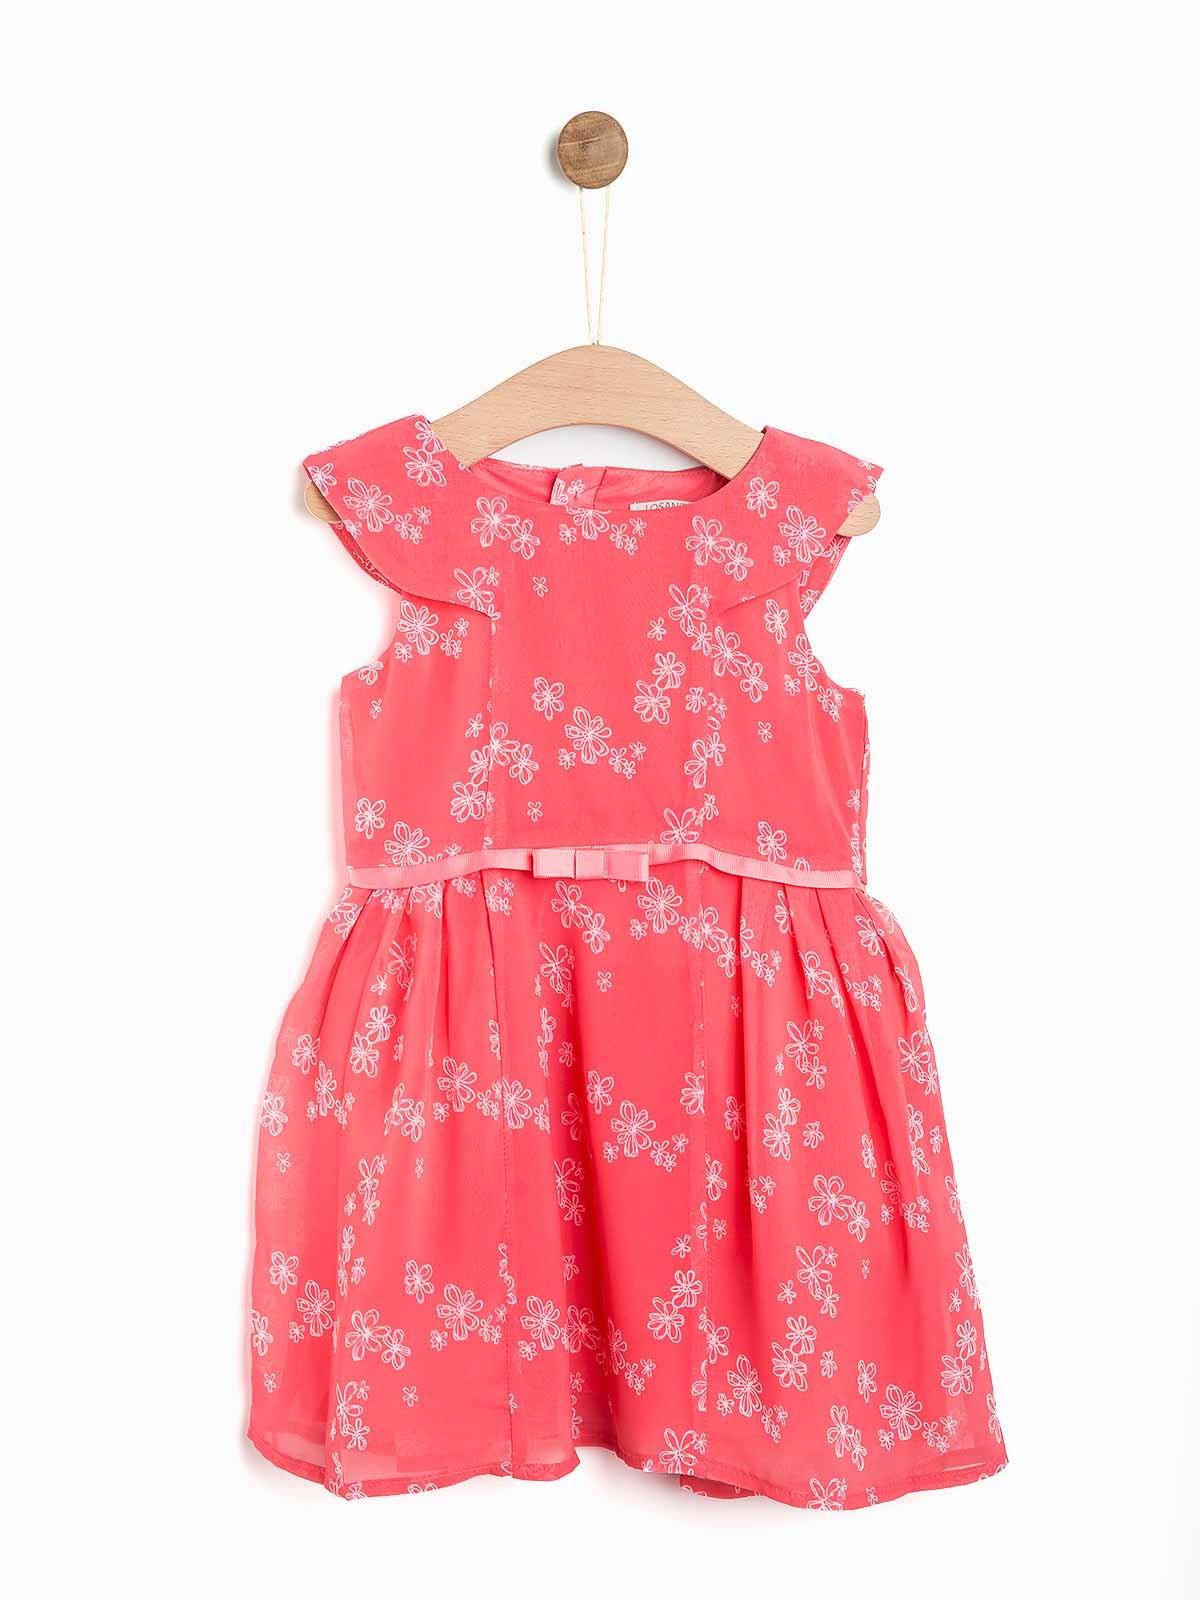 Vestido florido de menina